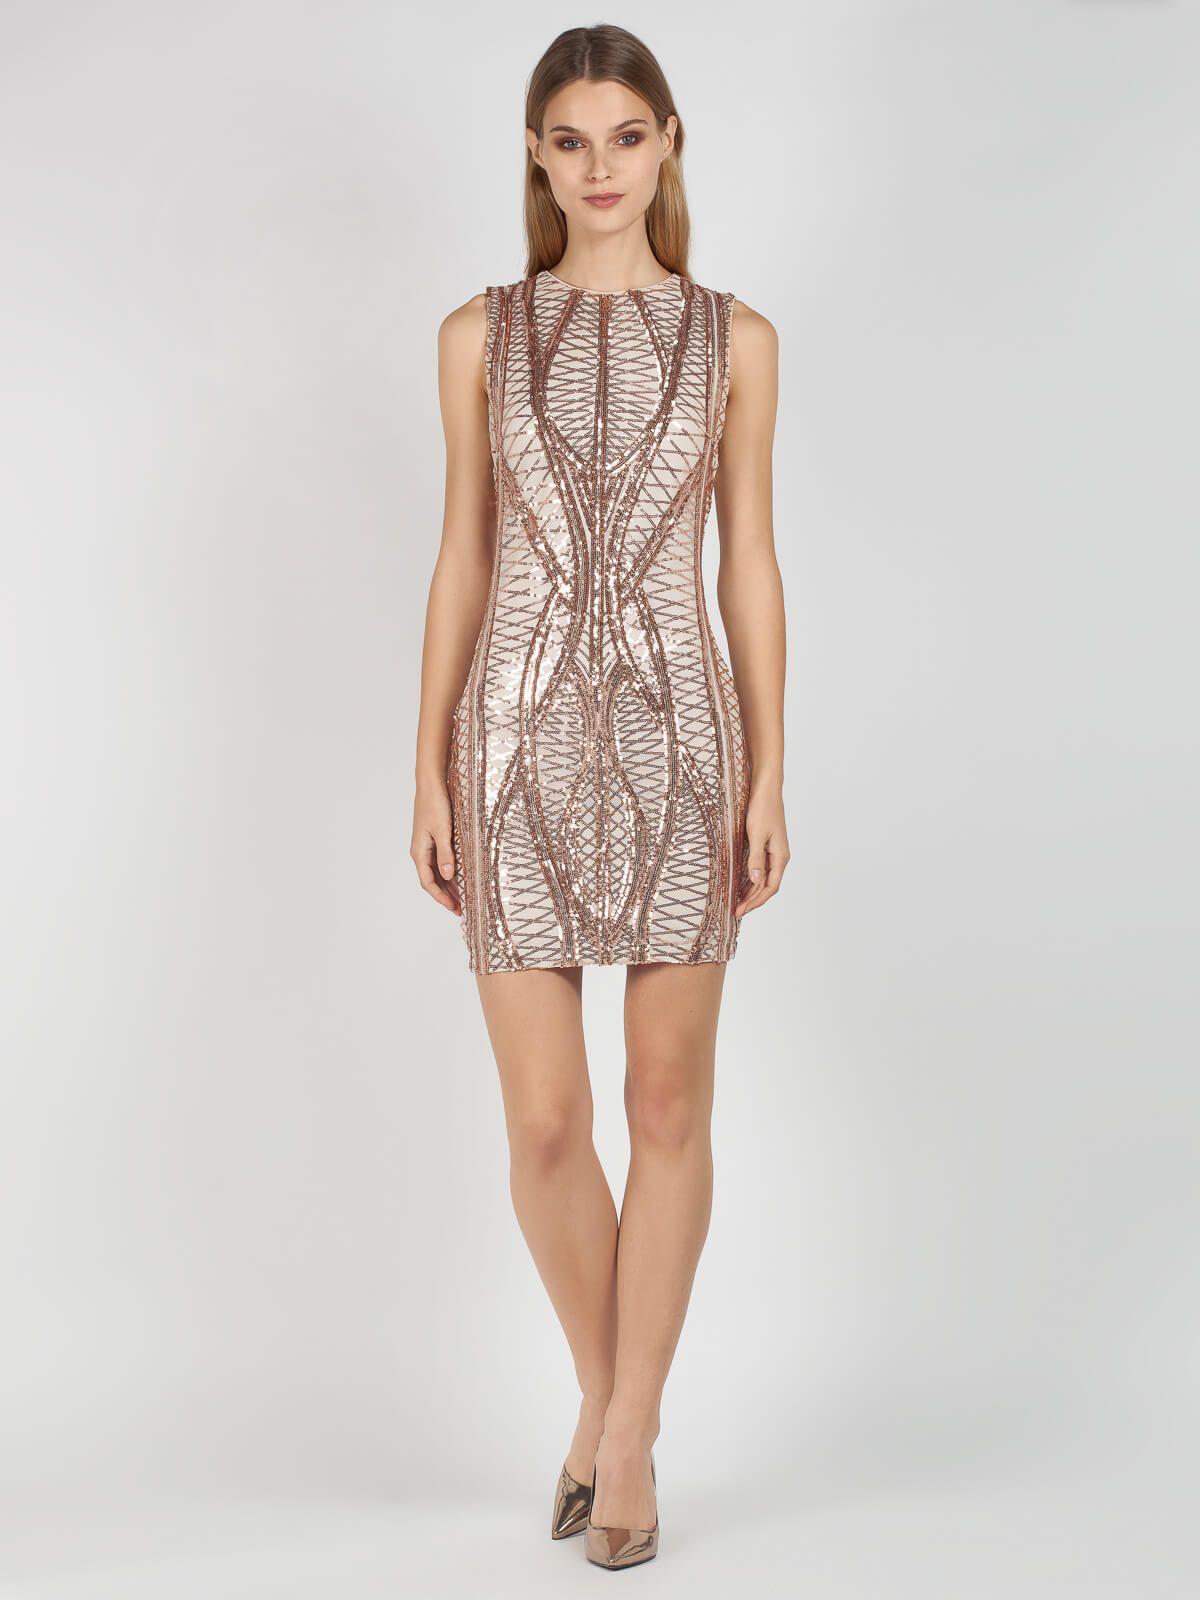 d83779f6fd27 Φόρεμα βραδινό αμάνικο σε ίσια γραμμή και μήκος μέχρι το γόνατο. Το φόρεμα  είναι από